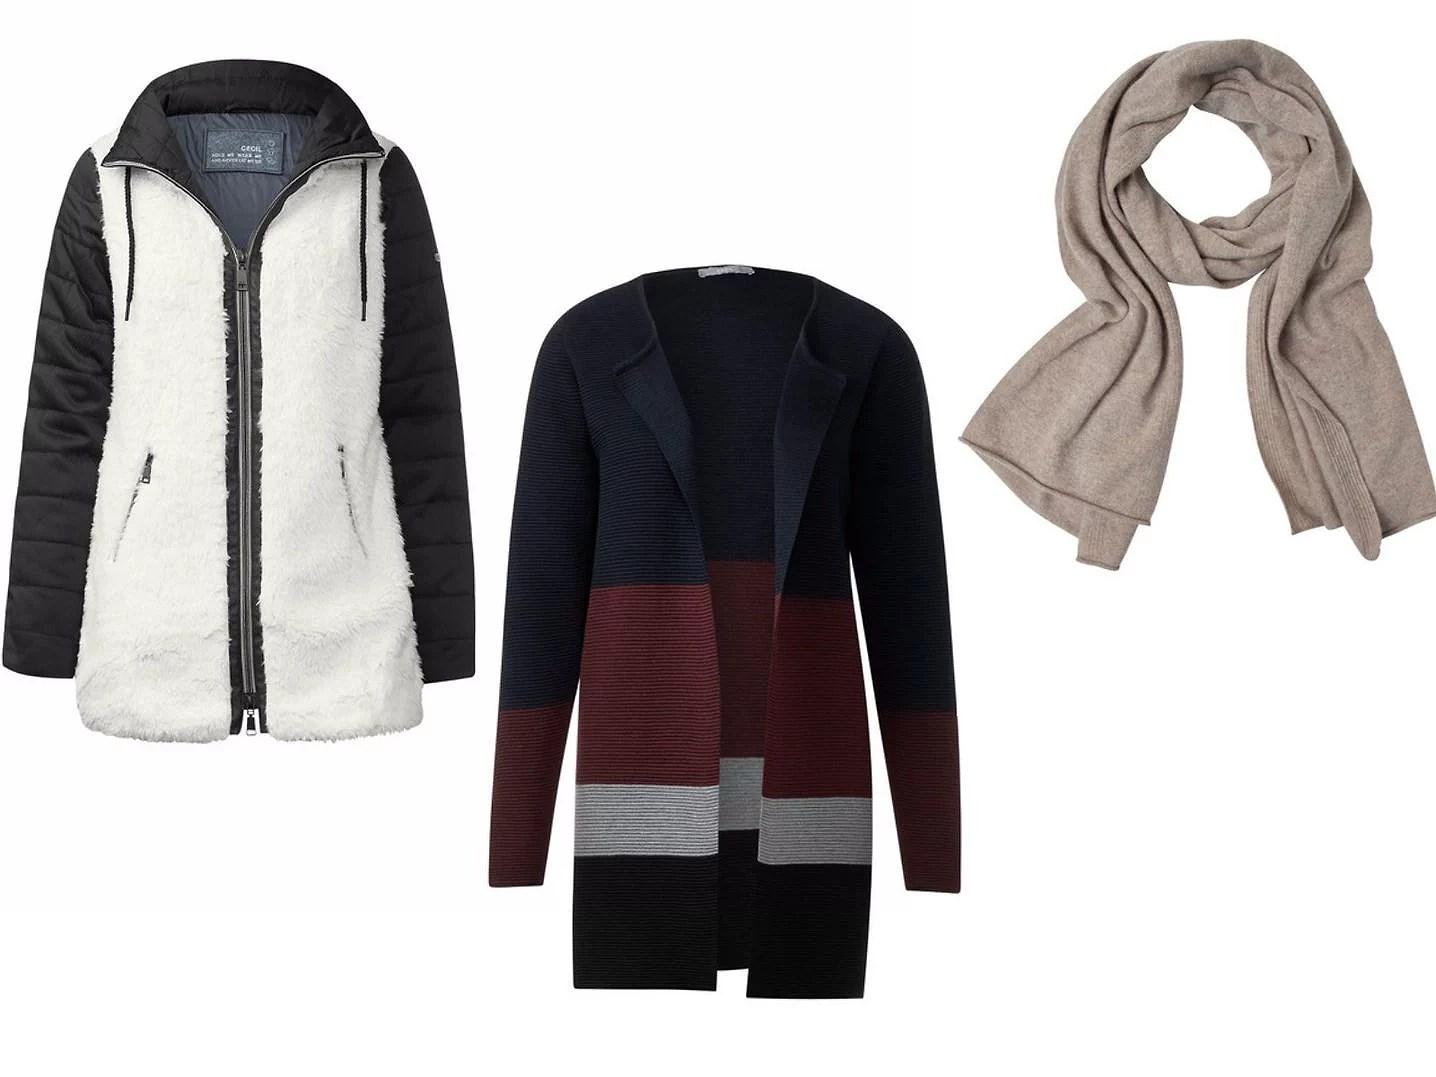 Februari outfits